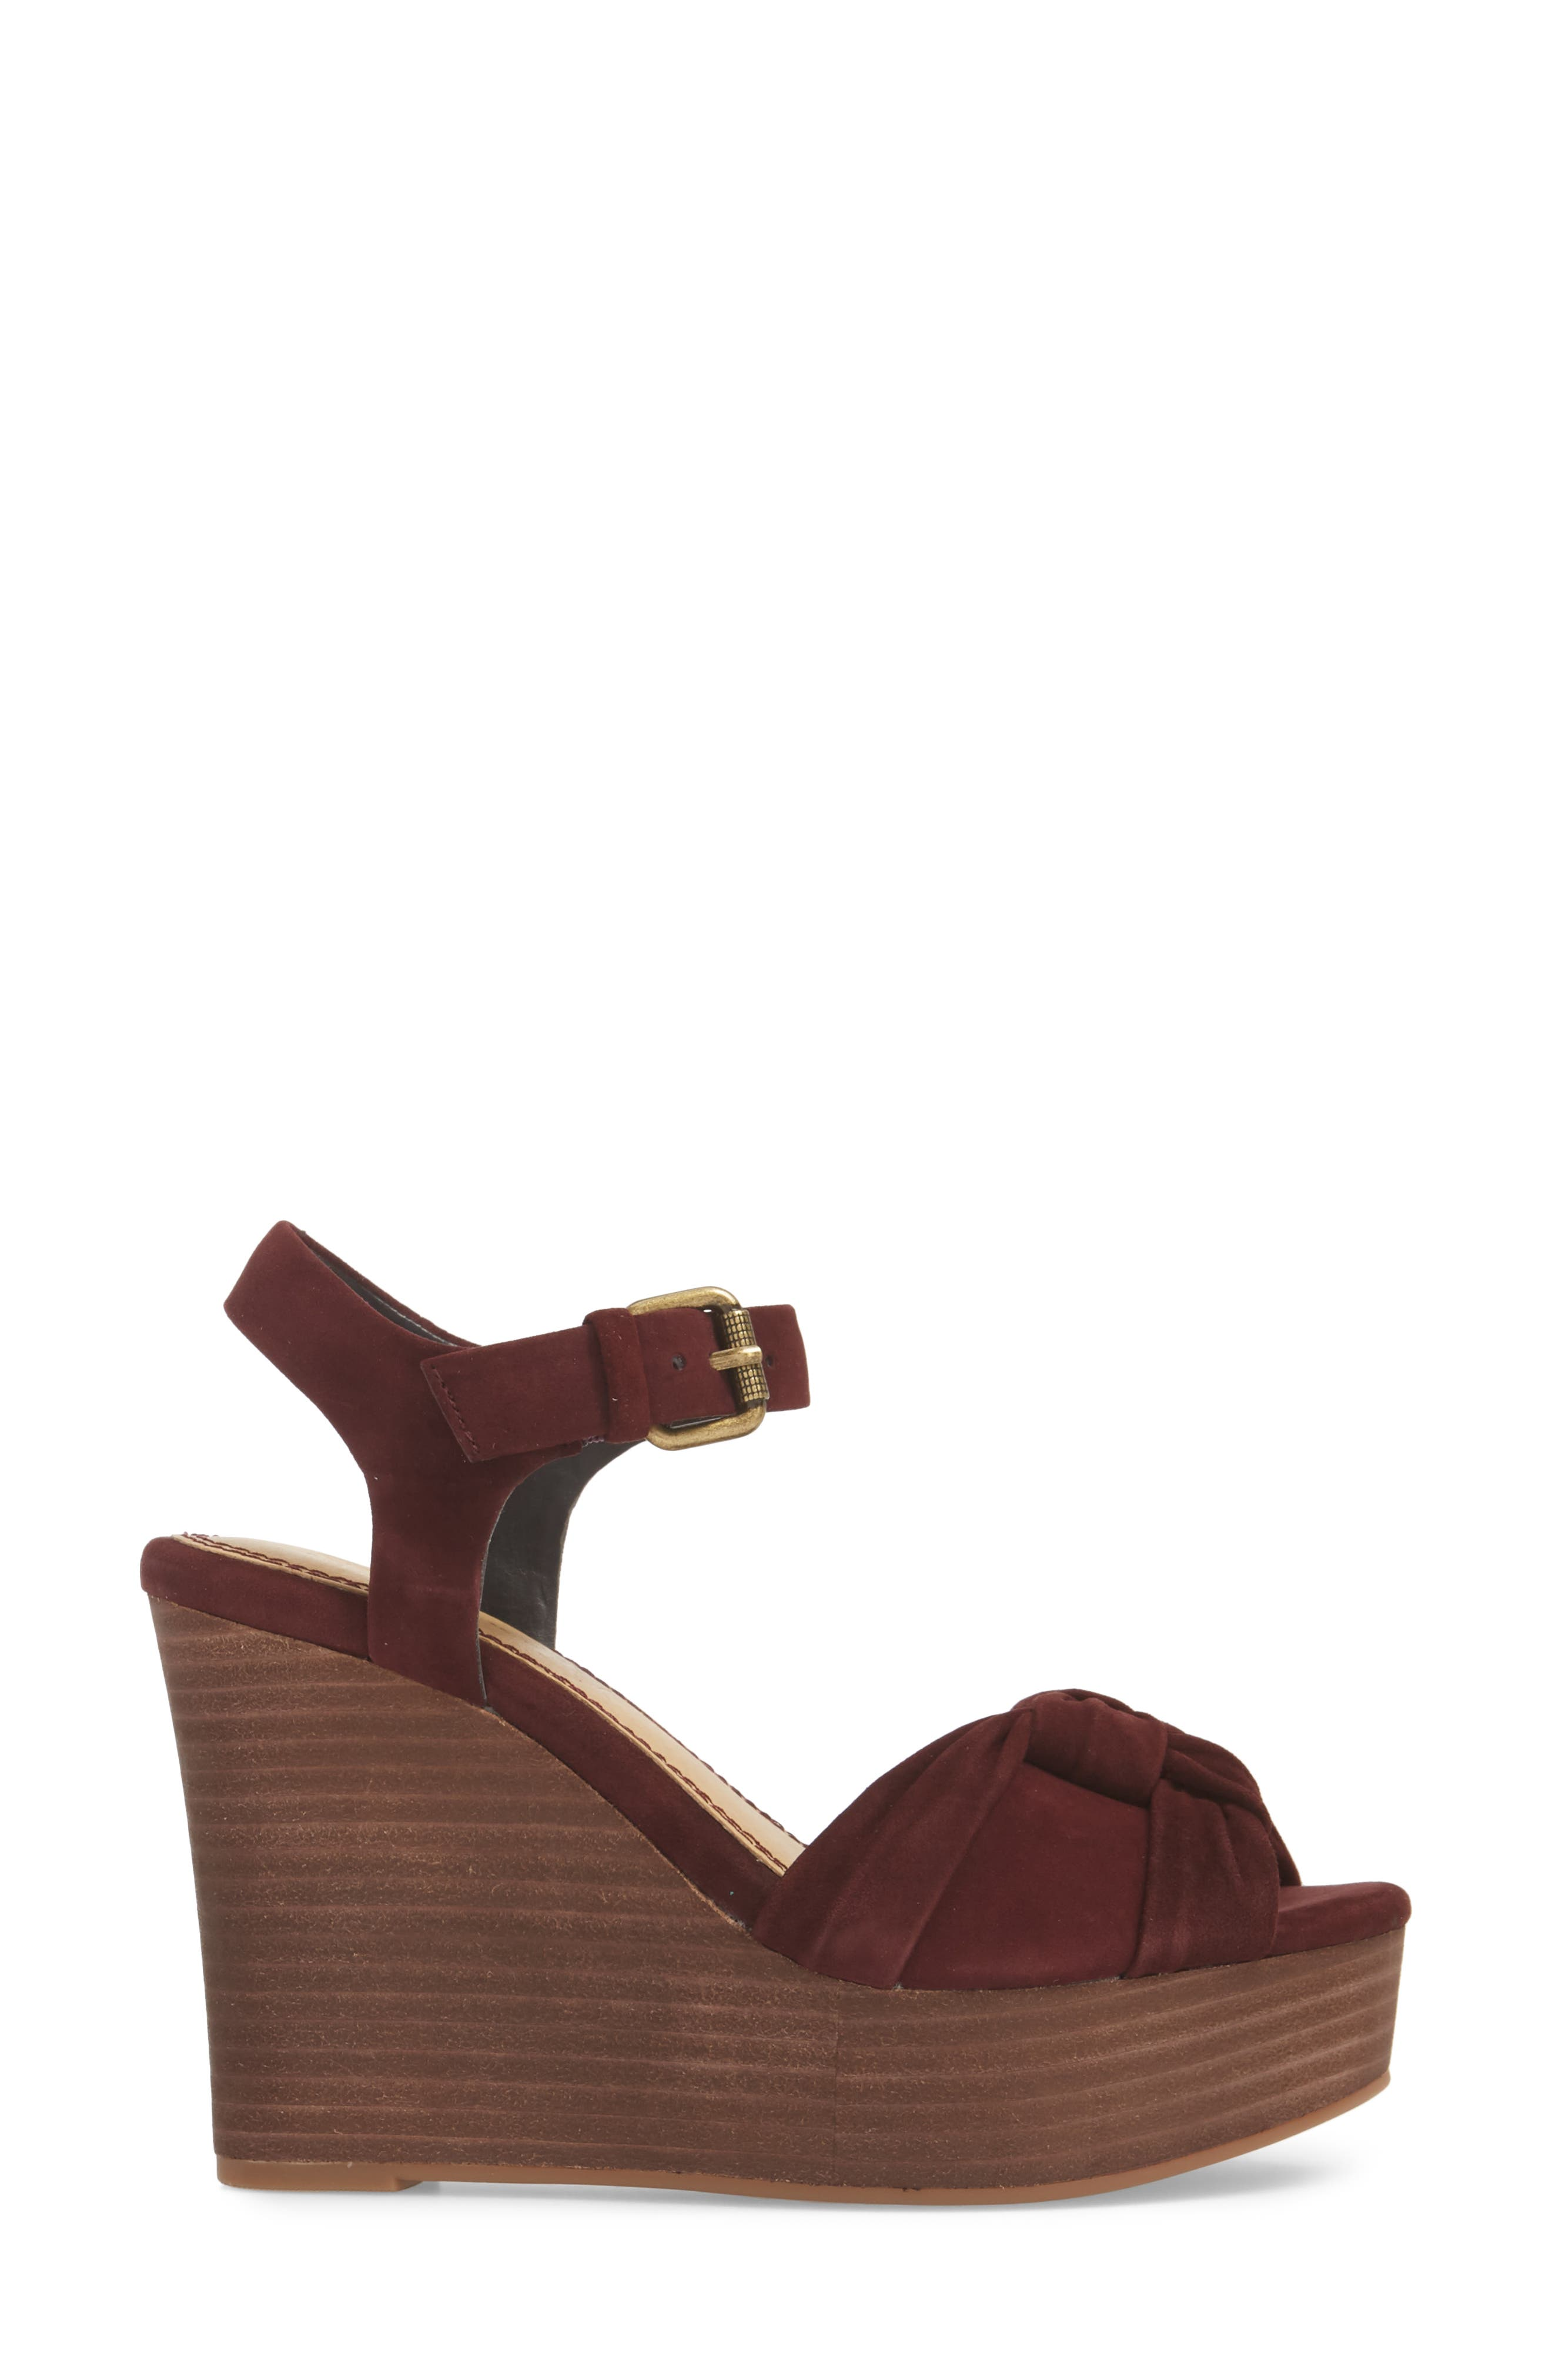 Nada Platform Wedge Sandal,                             Alternate thumbnail 6, color,                             Deep Plum Suede